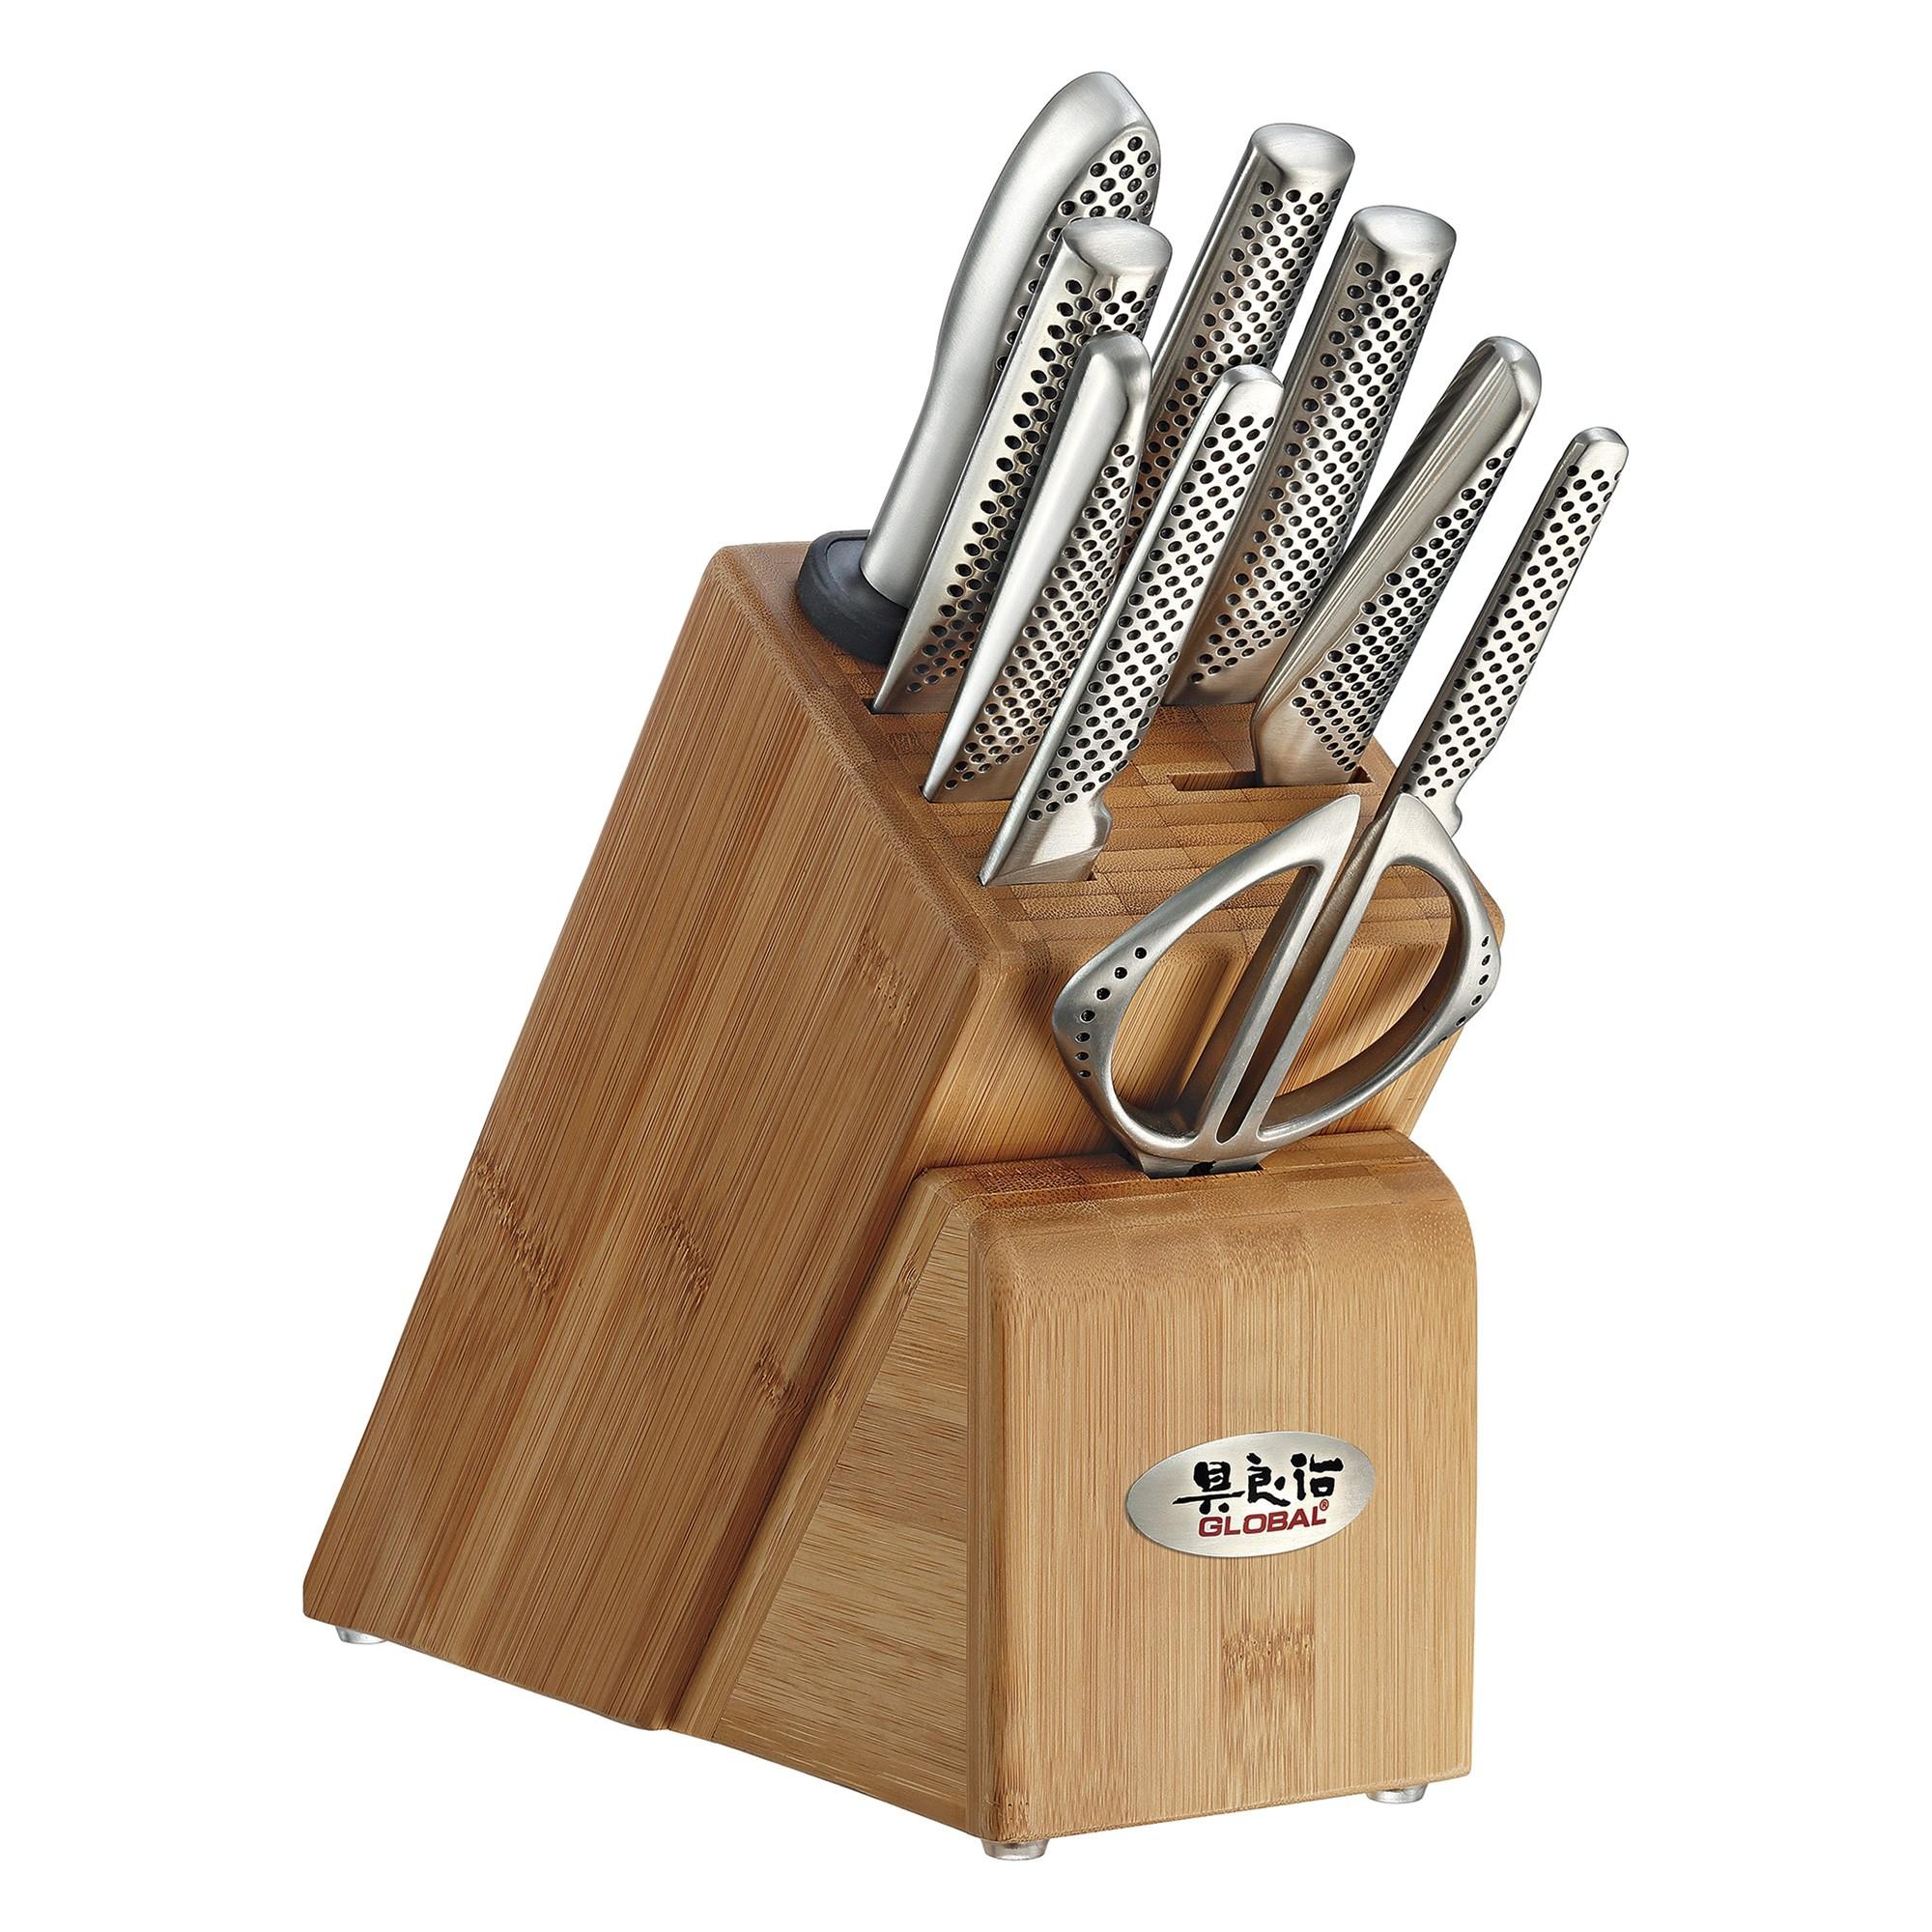 Global Takashi 10 Piece Knife Block Set